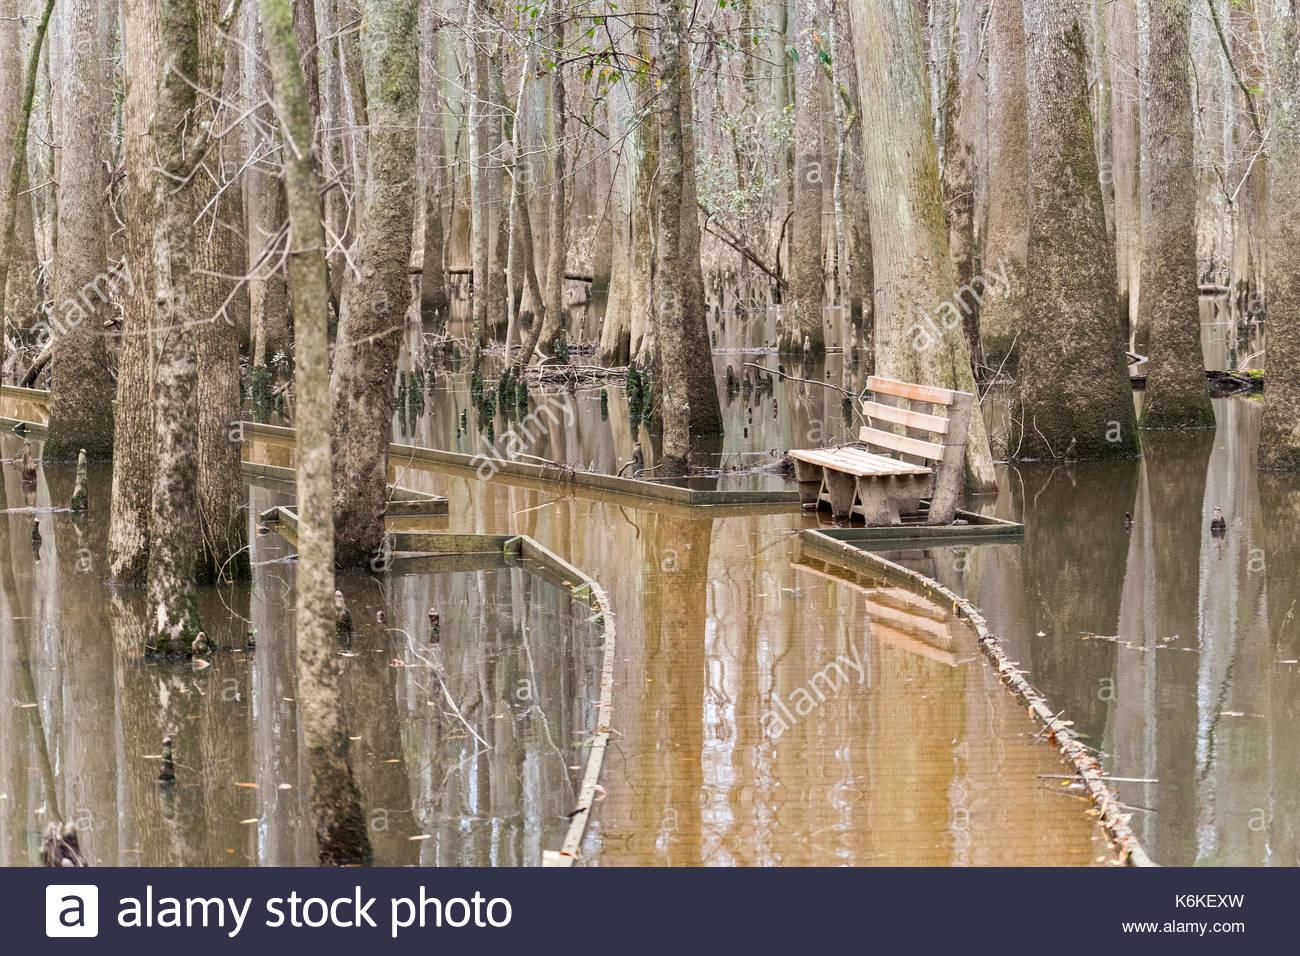 Hopkins, Congaree National Park, South Carolina, United States of America - Stock Image